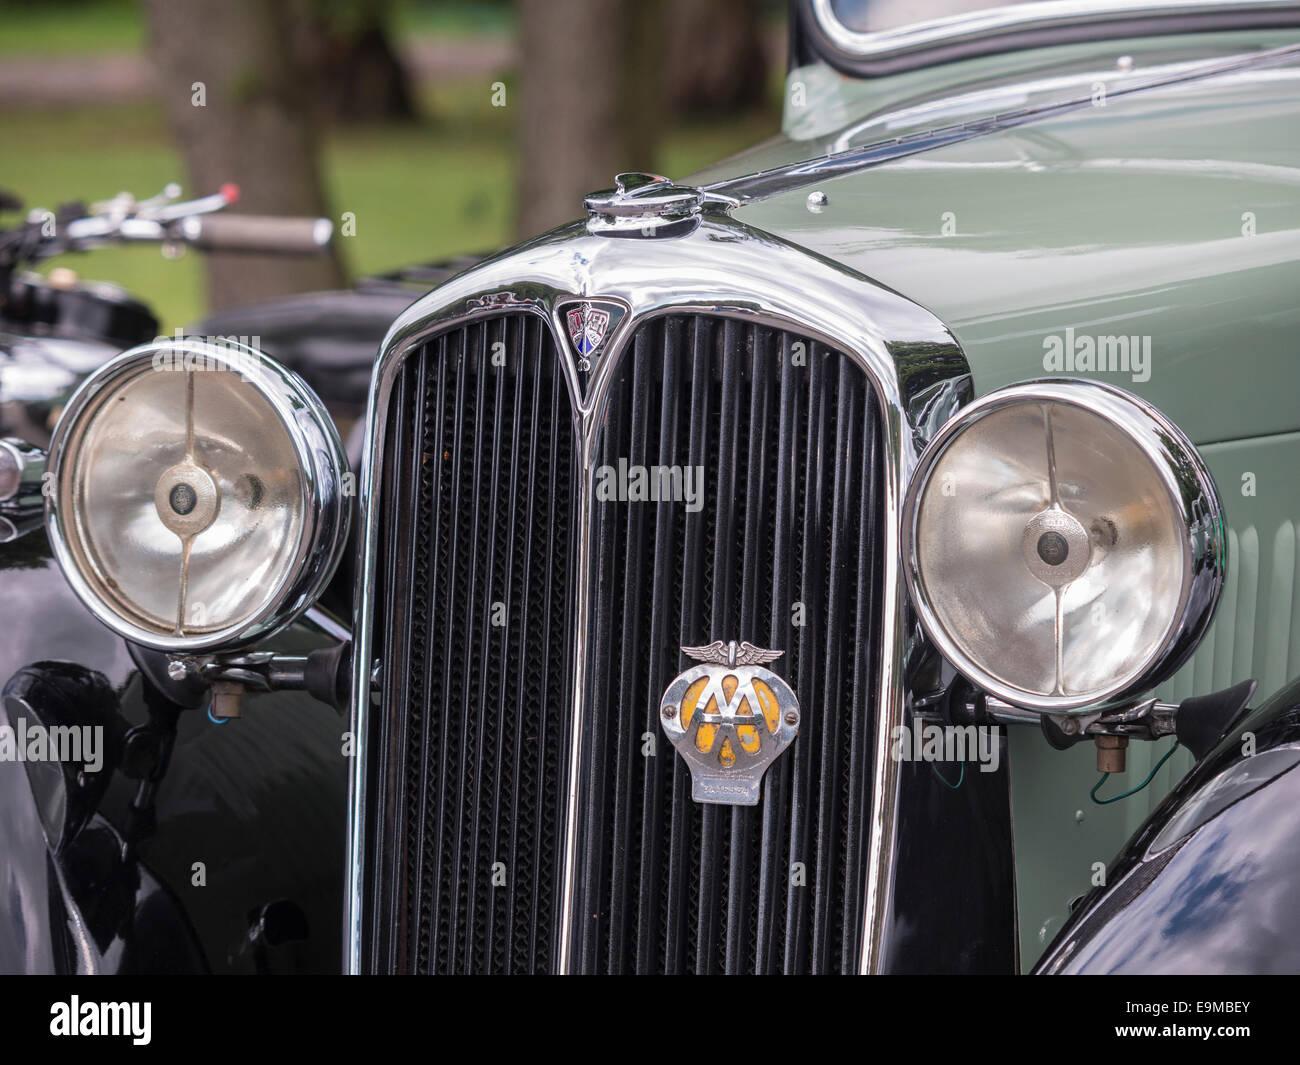 Standard Vanguard 1940\'s era vintage and classic English car Stock ...